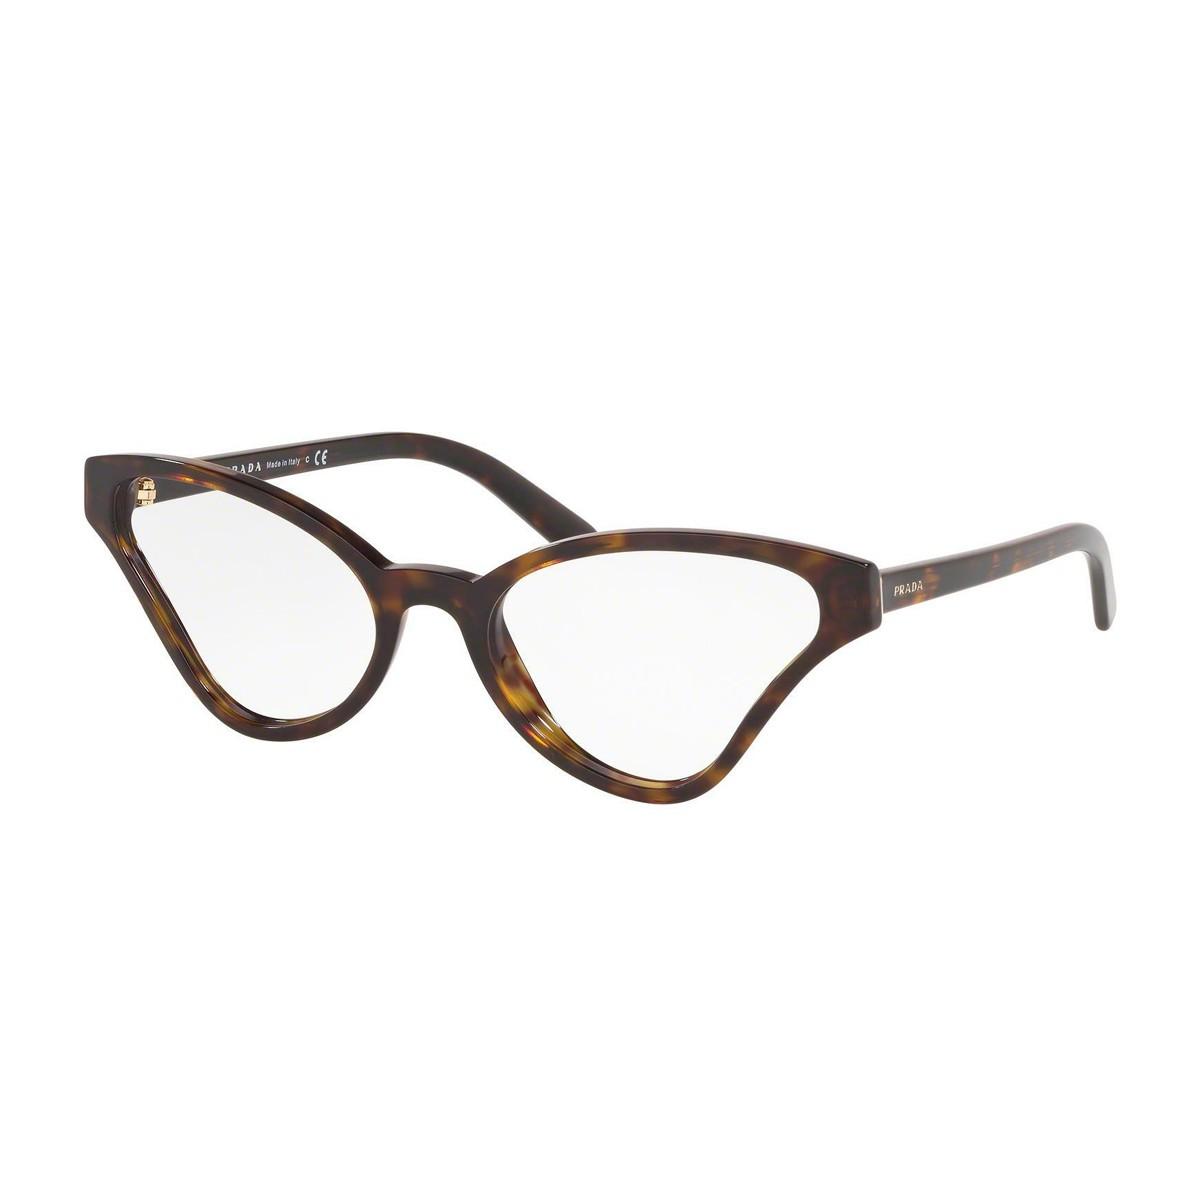 Prada PR 06XV | Women's eyeglasses